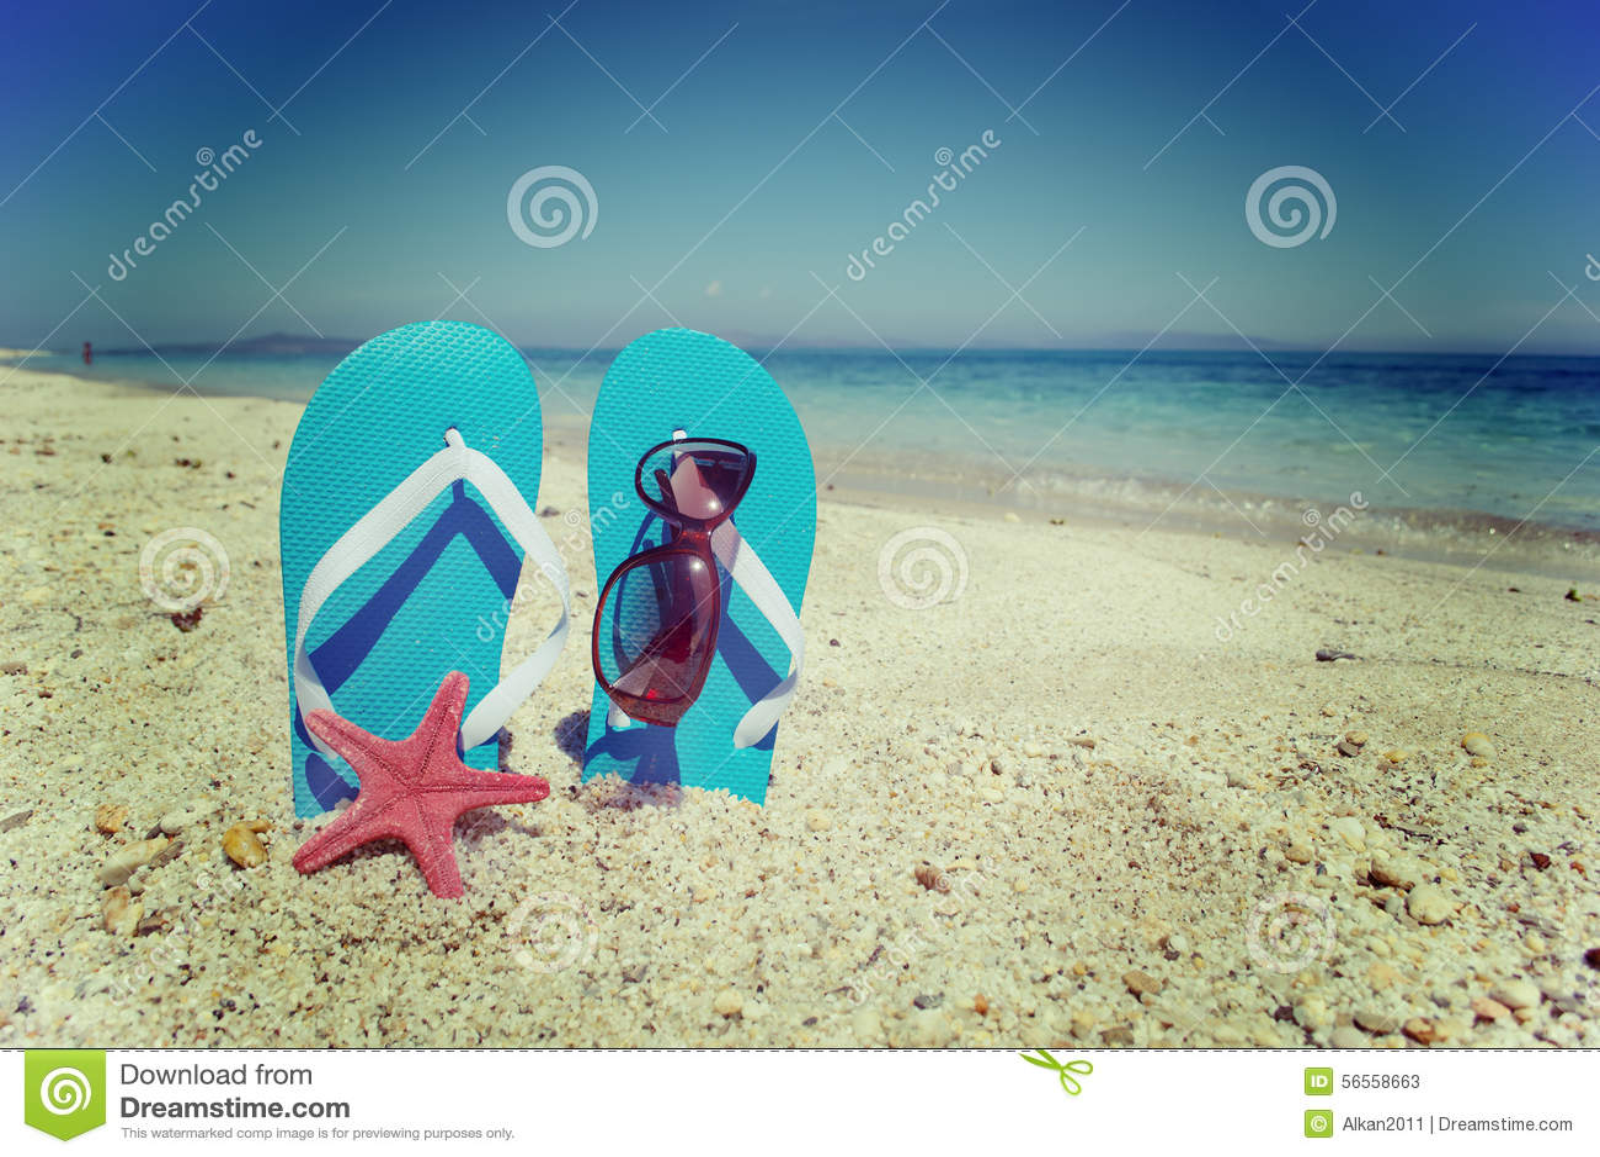 Download Σανδάλια και αστερίας θαλασσίως Στοκ Εικόνα - εικόνα από ακτή, ωκεανός: 56558663